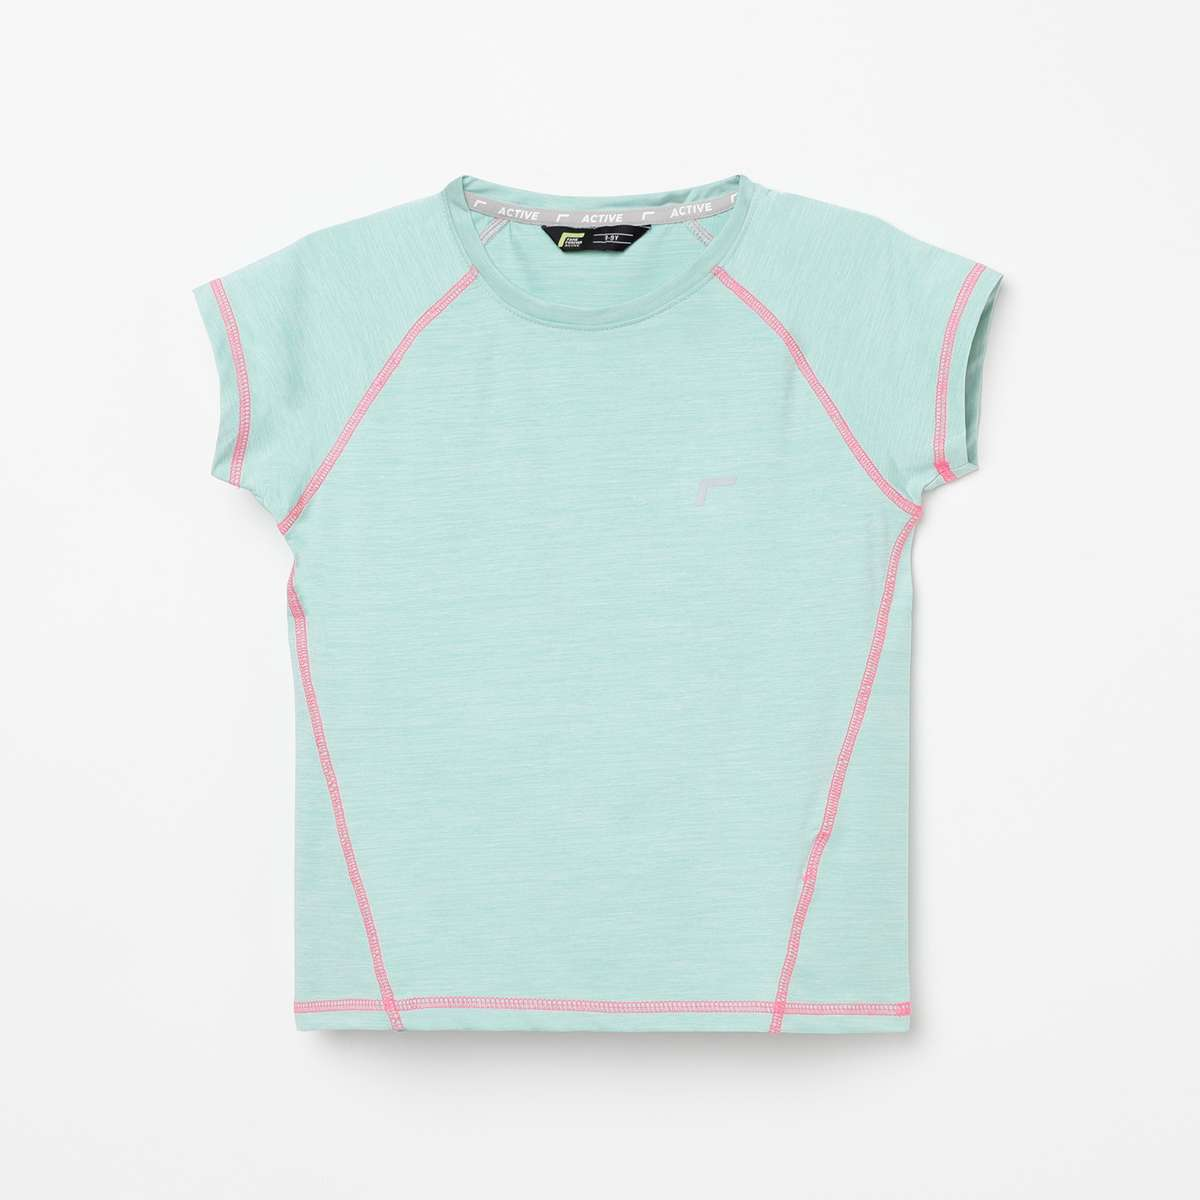 1.FAME ACTIVE Girls Textured Knit T-shirt